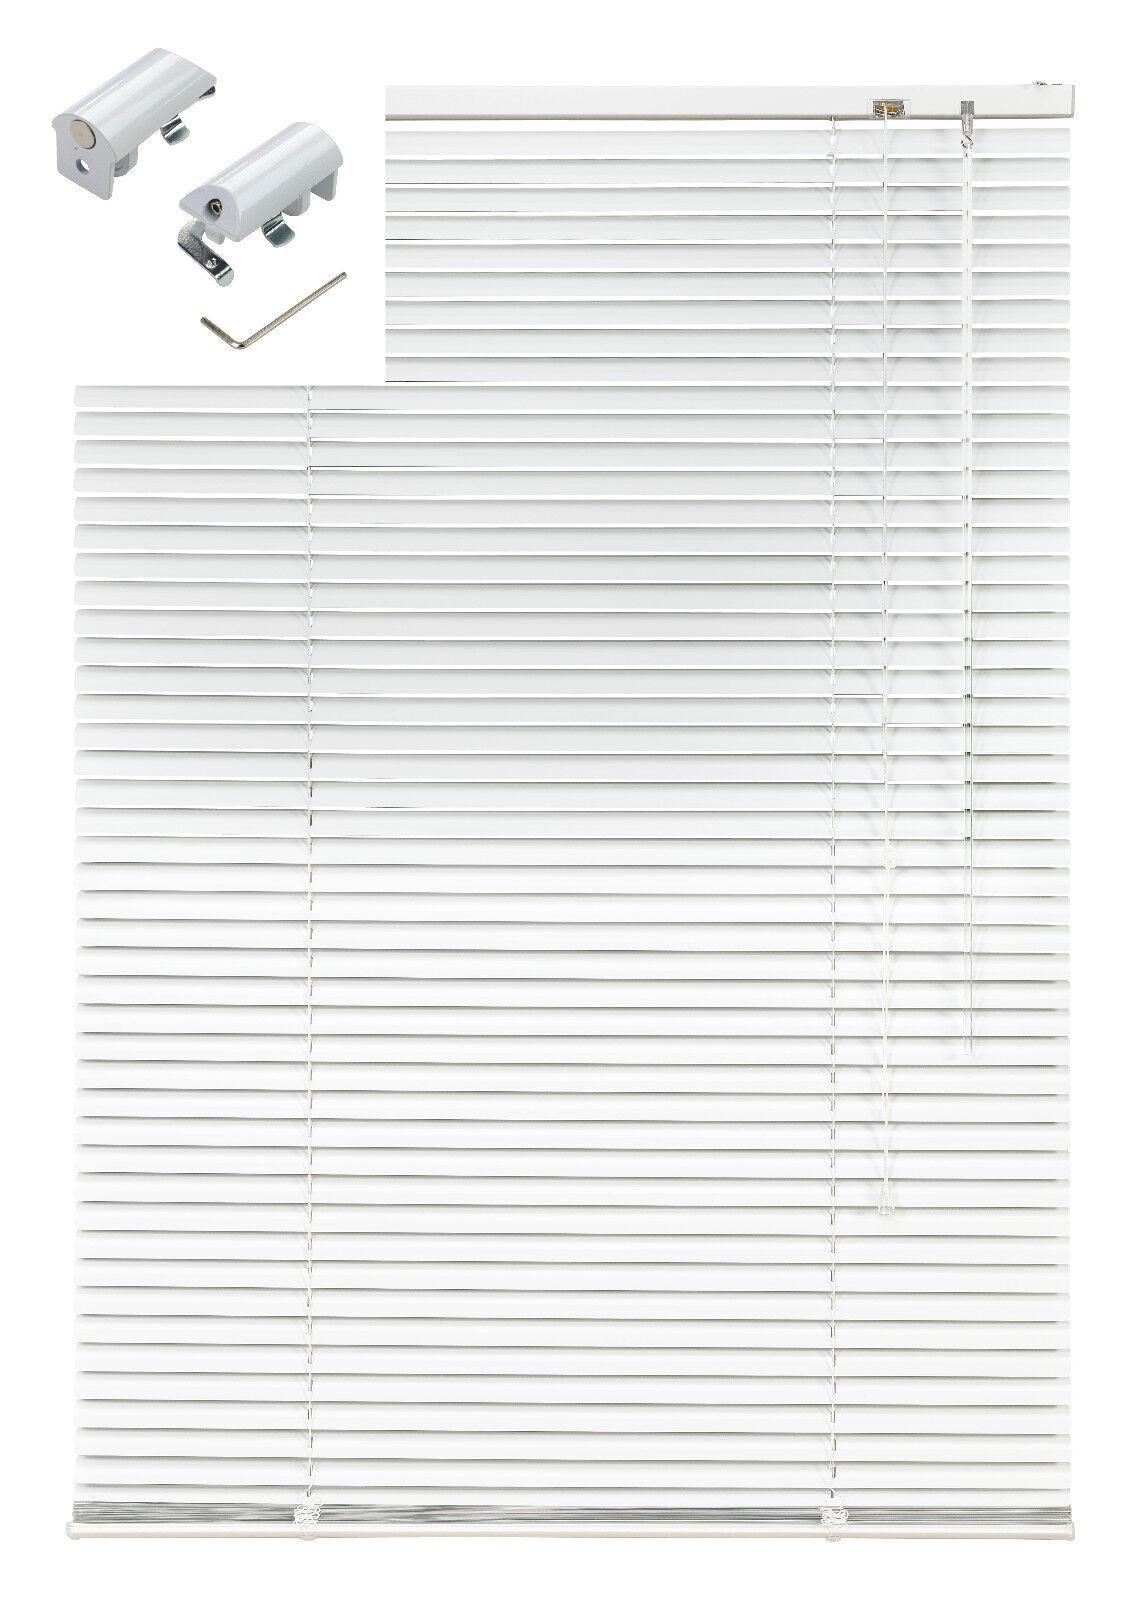 Aluminium Jalousie Alu Jalousette Jalousette Jalousette Weiß Silber Tür Fenster Klemmfix Rollo Plissee   Speichern  dc3c47